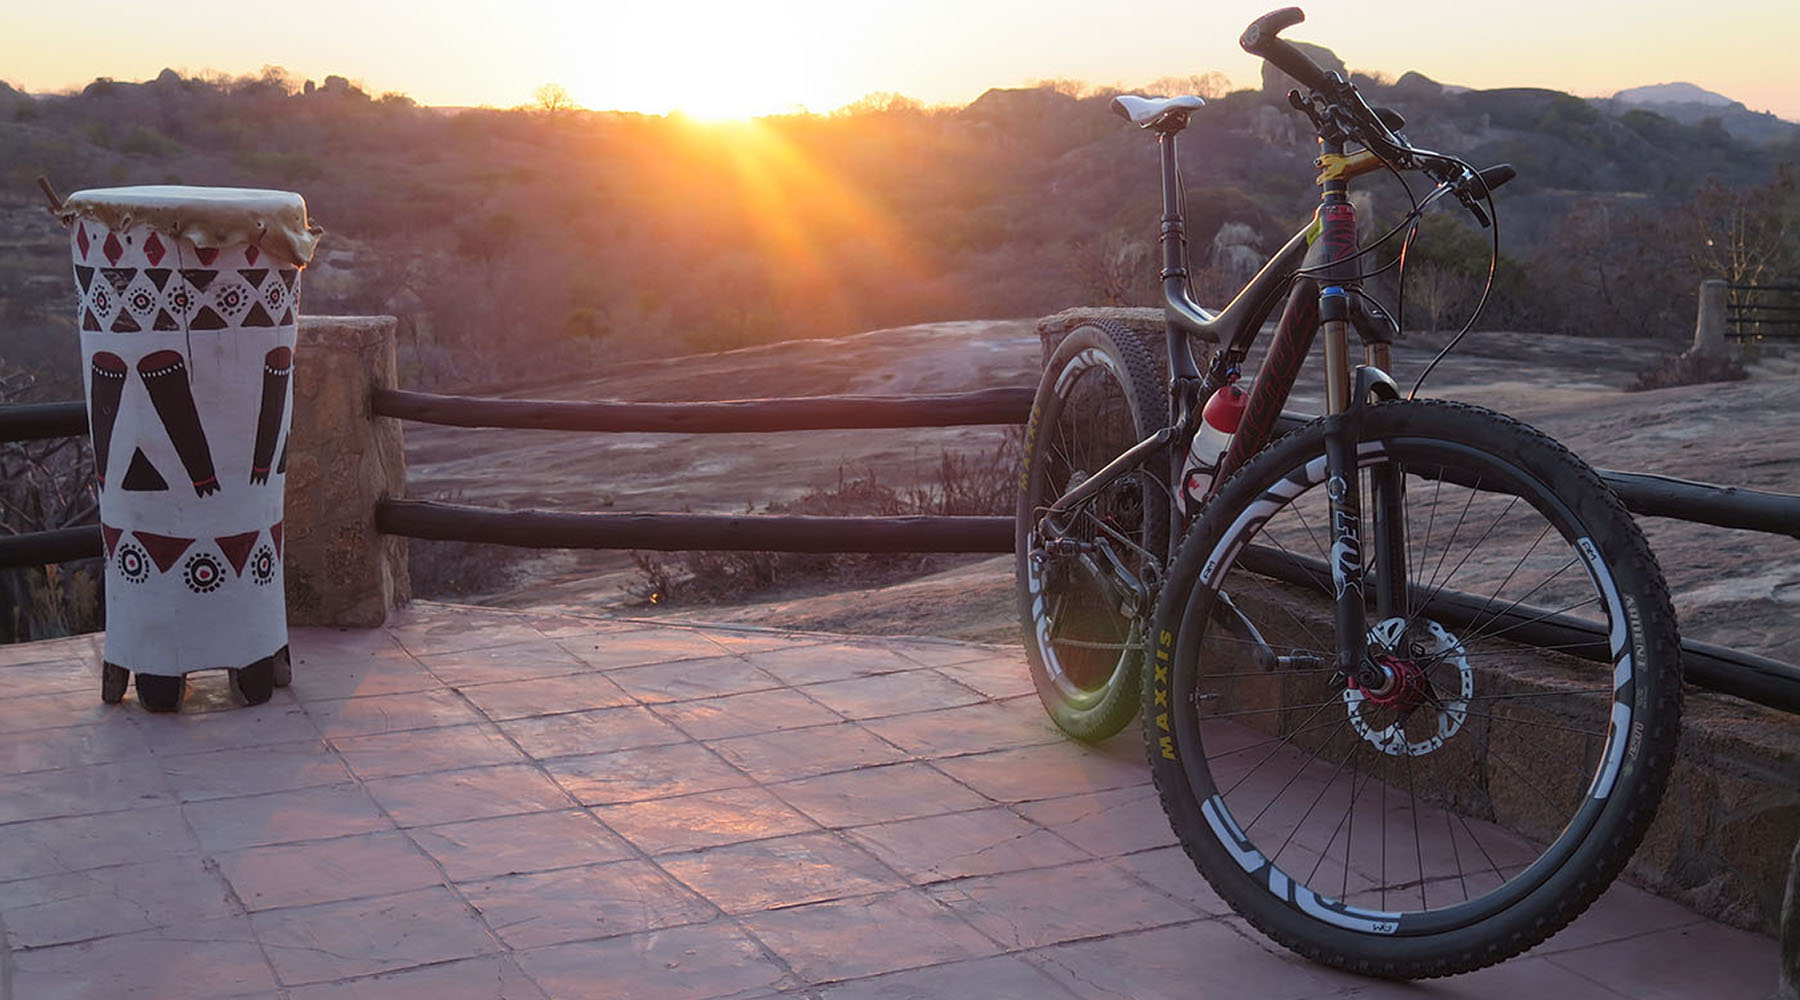 taste-zulu-kingdom-detour-trails-tours-1000-hills-kzn-mountain-biking-south-africa